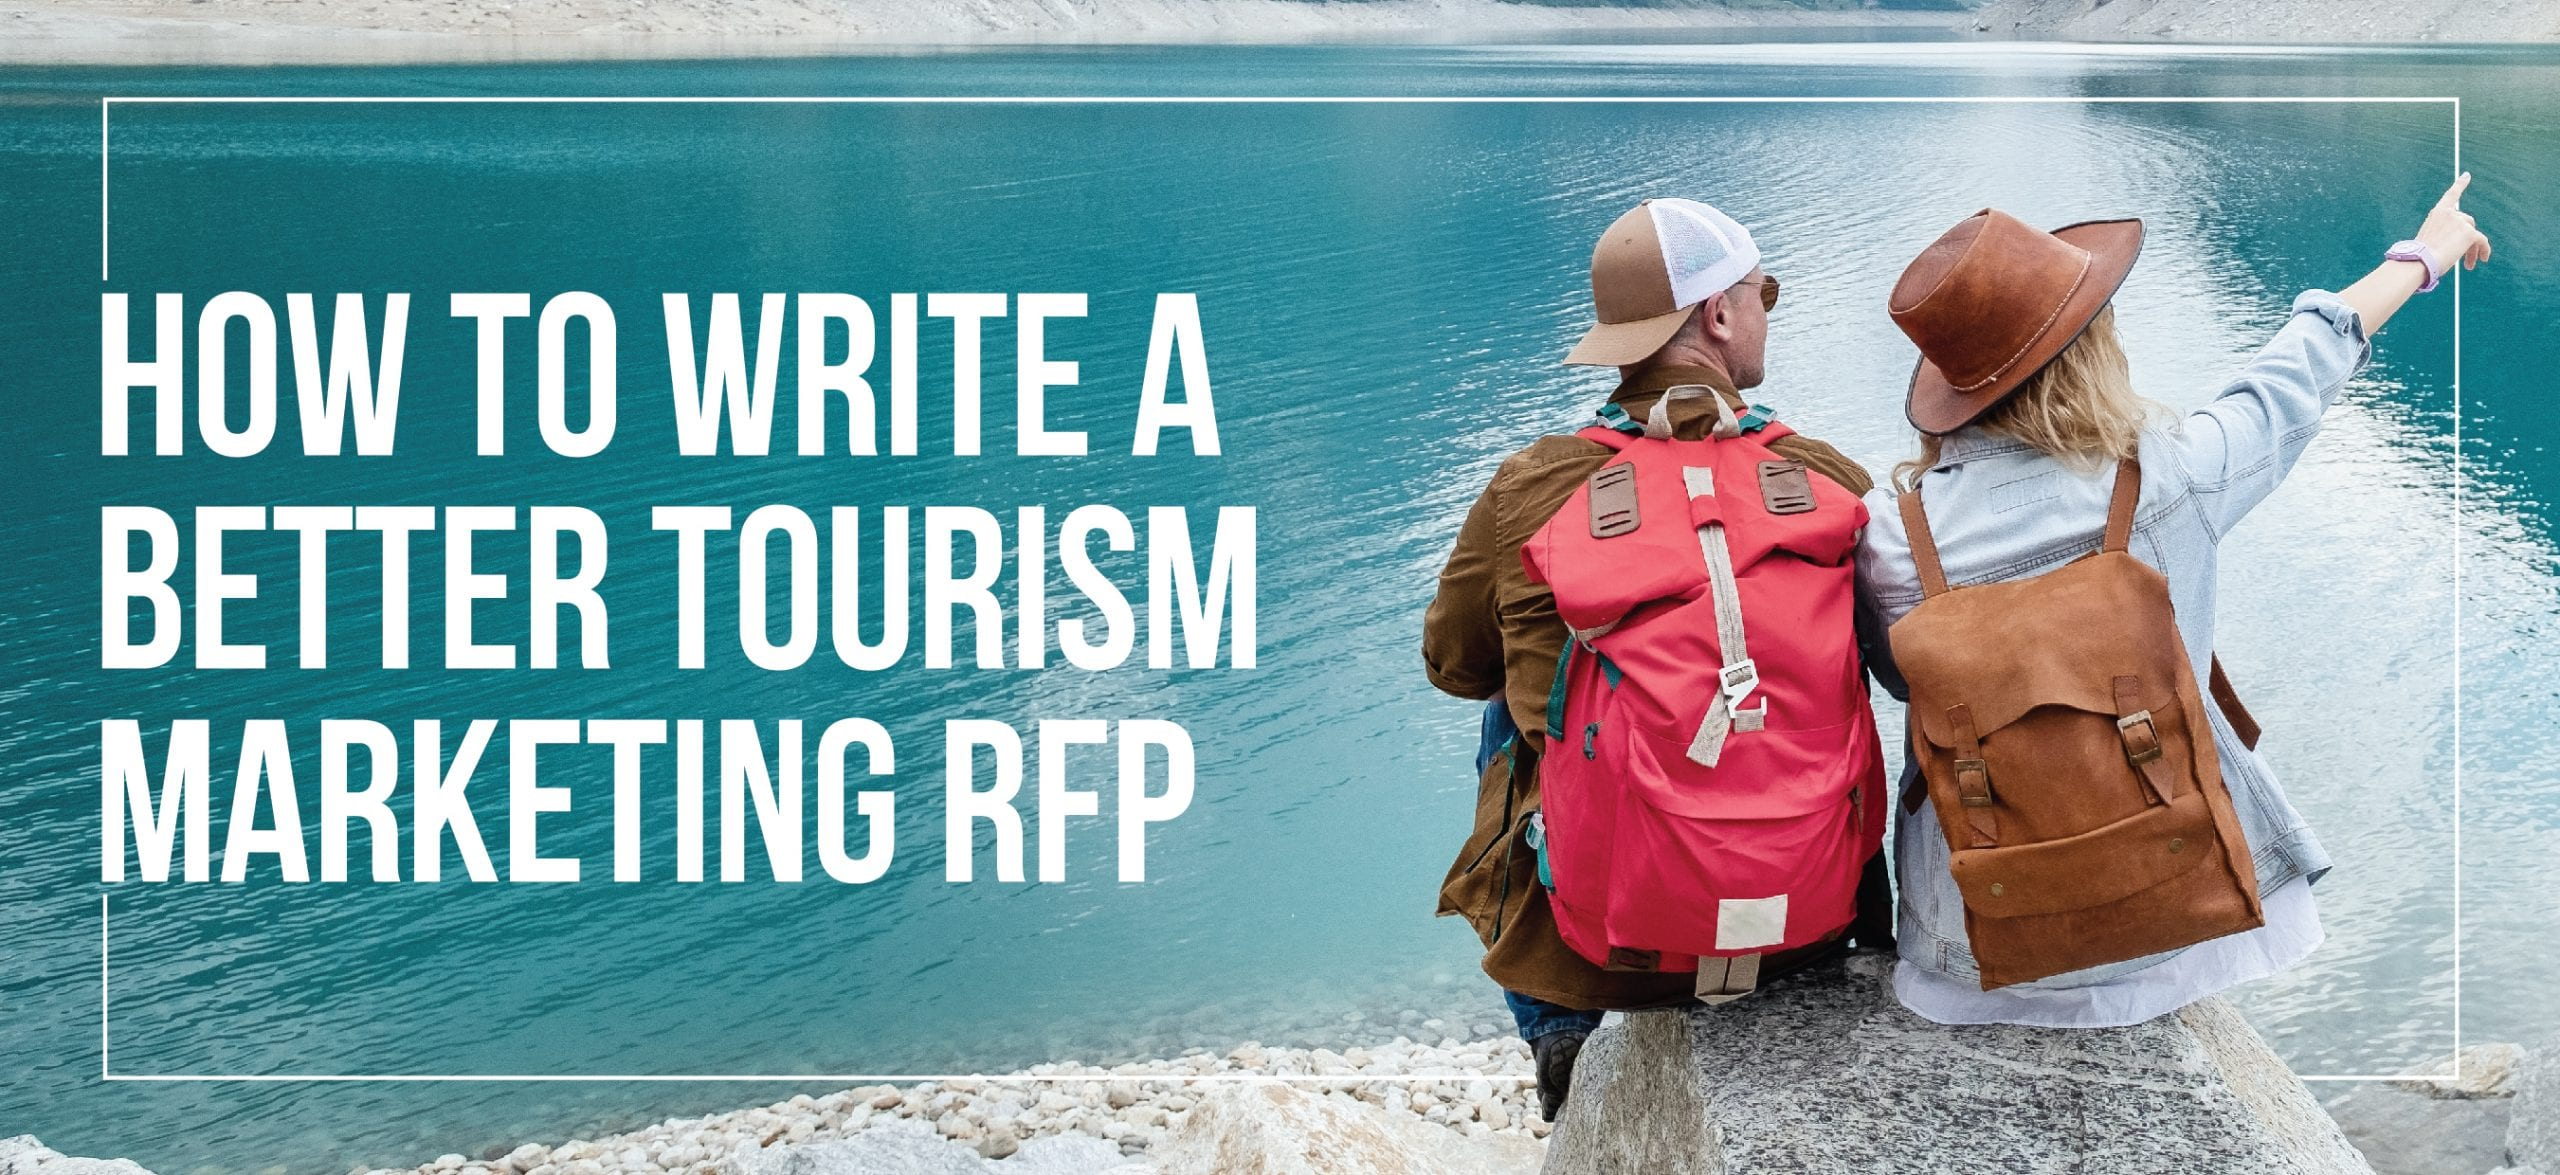 Write a Better Tourism Marketing RFP